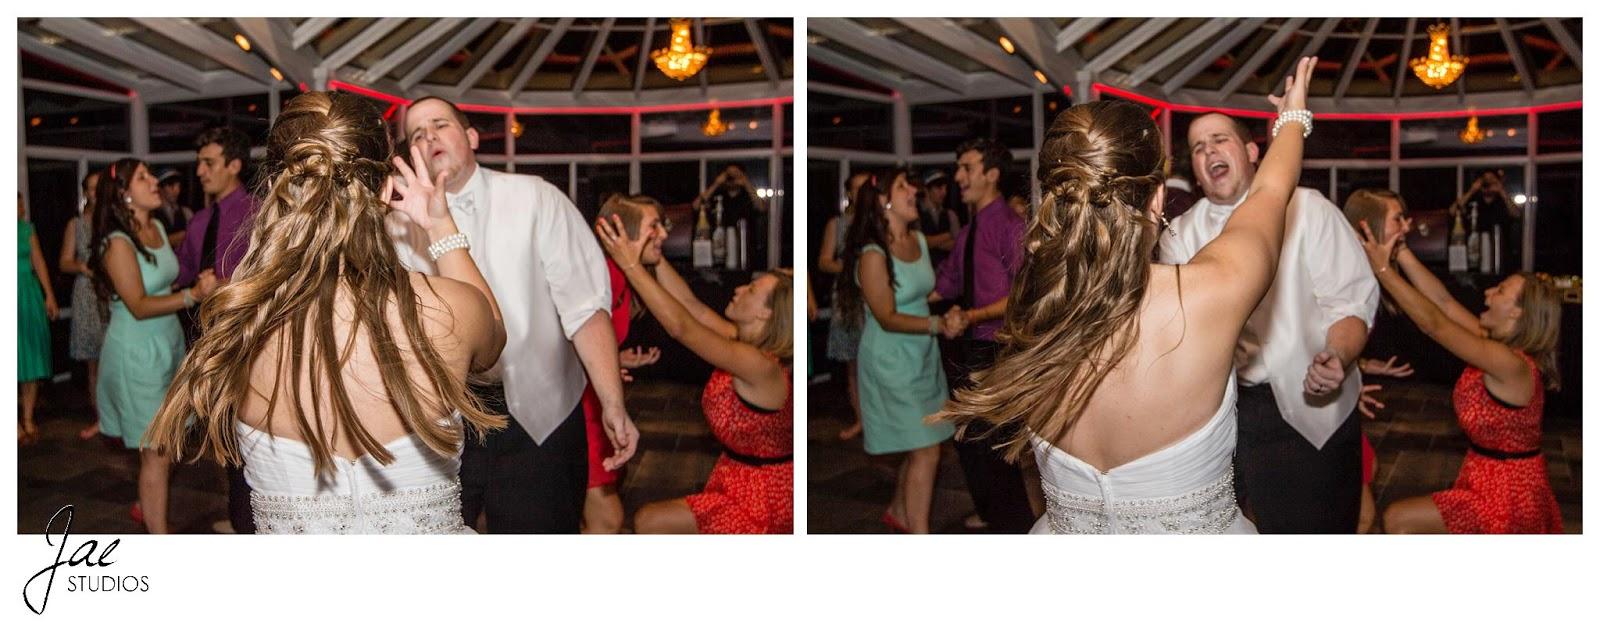 Jonathan and Julie, Bird cage, West Manor Estate, Wedding, Lynchburg, Virginia, Jae Studios, wedding dress, hair, groom, dancing